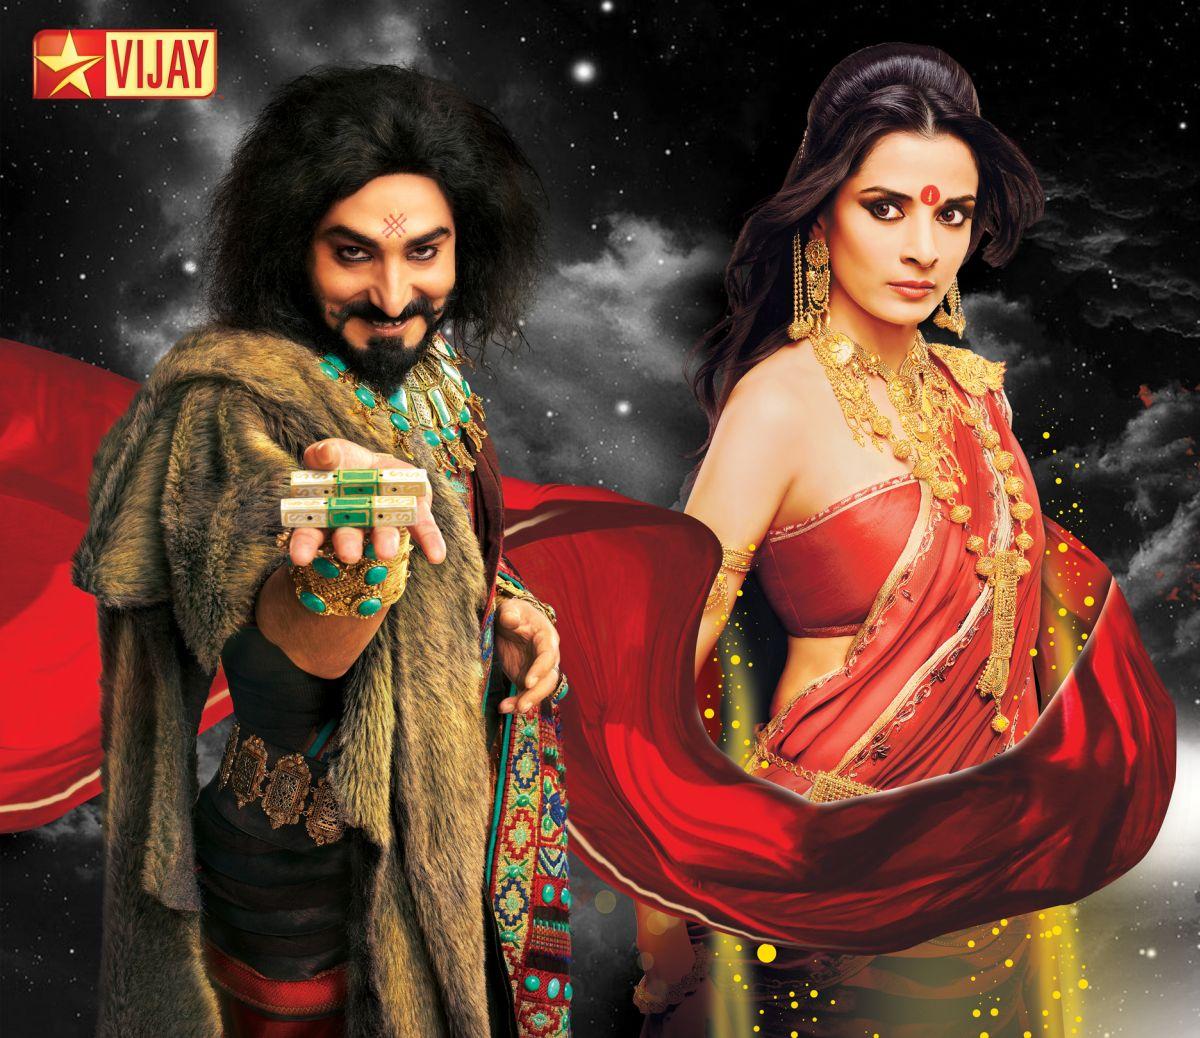 Mahabharatam On Vijay Tv The Beginning Of The Battle